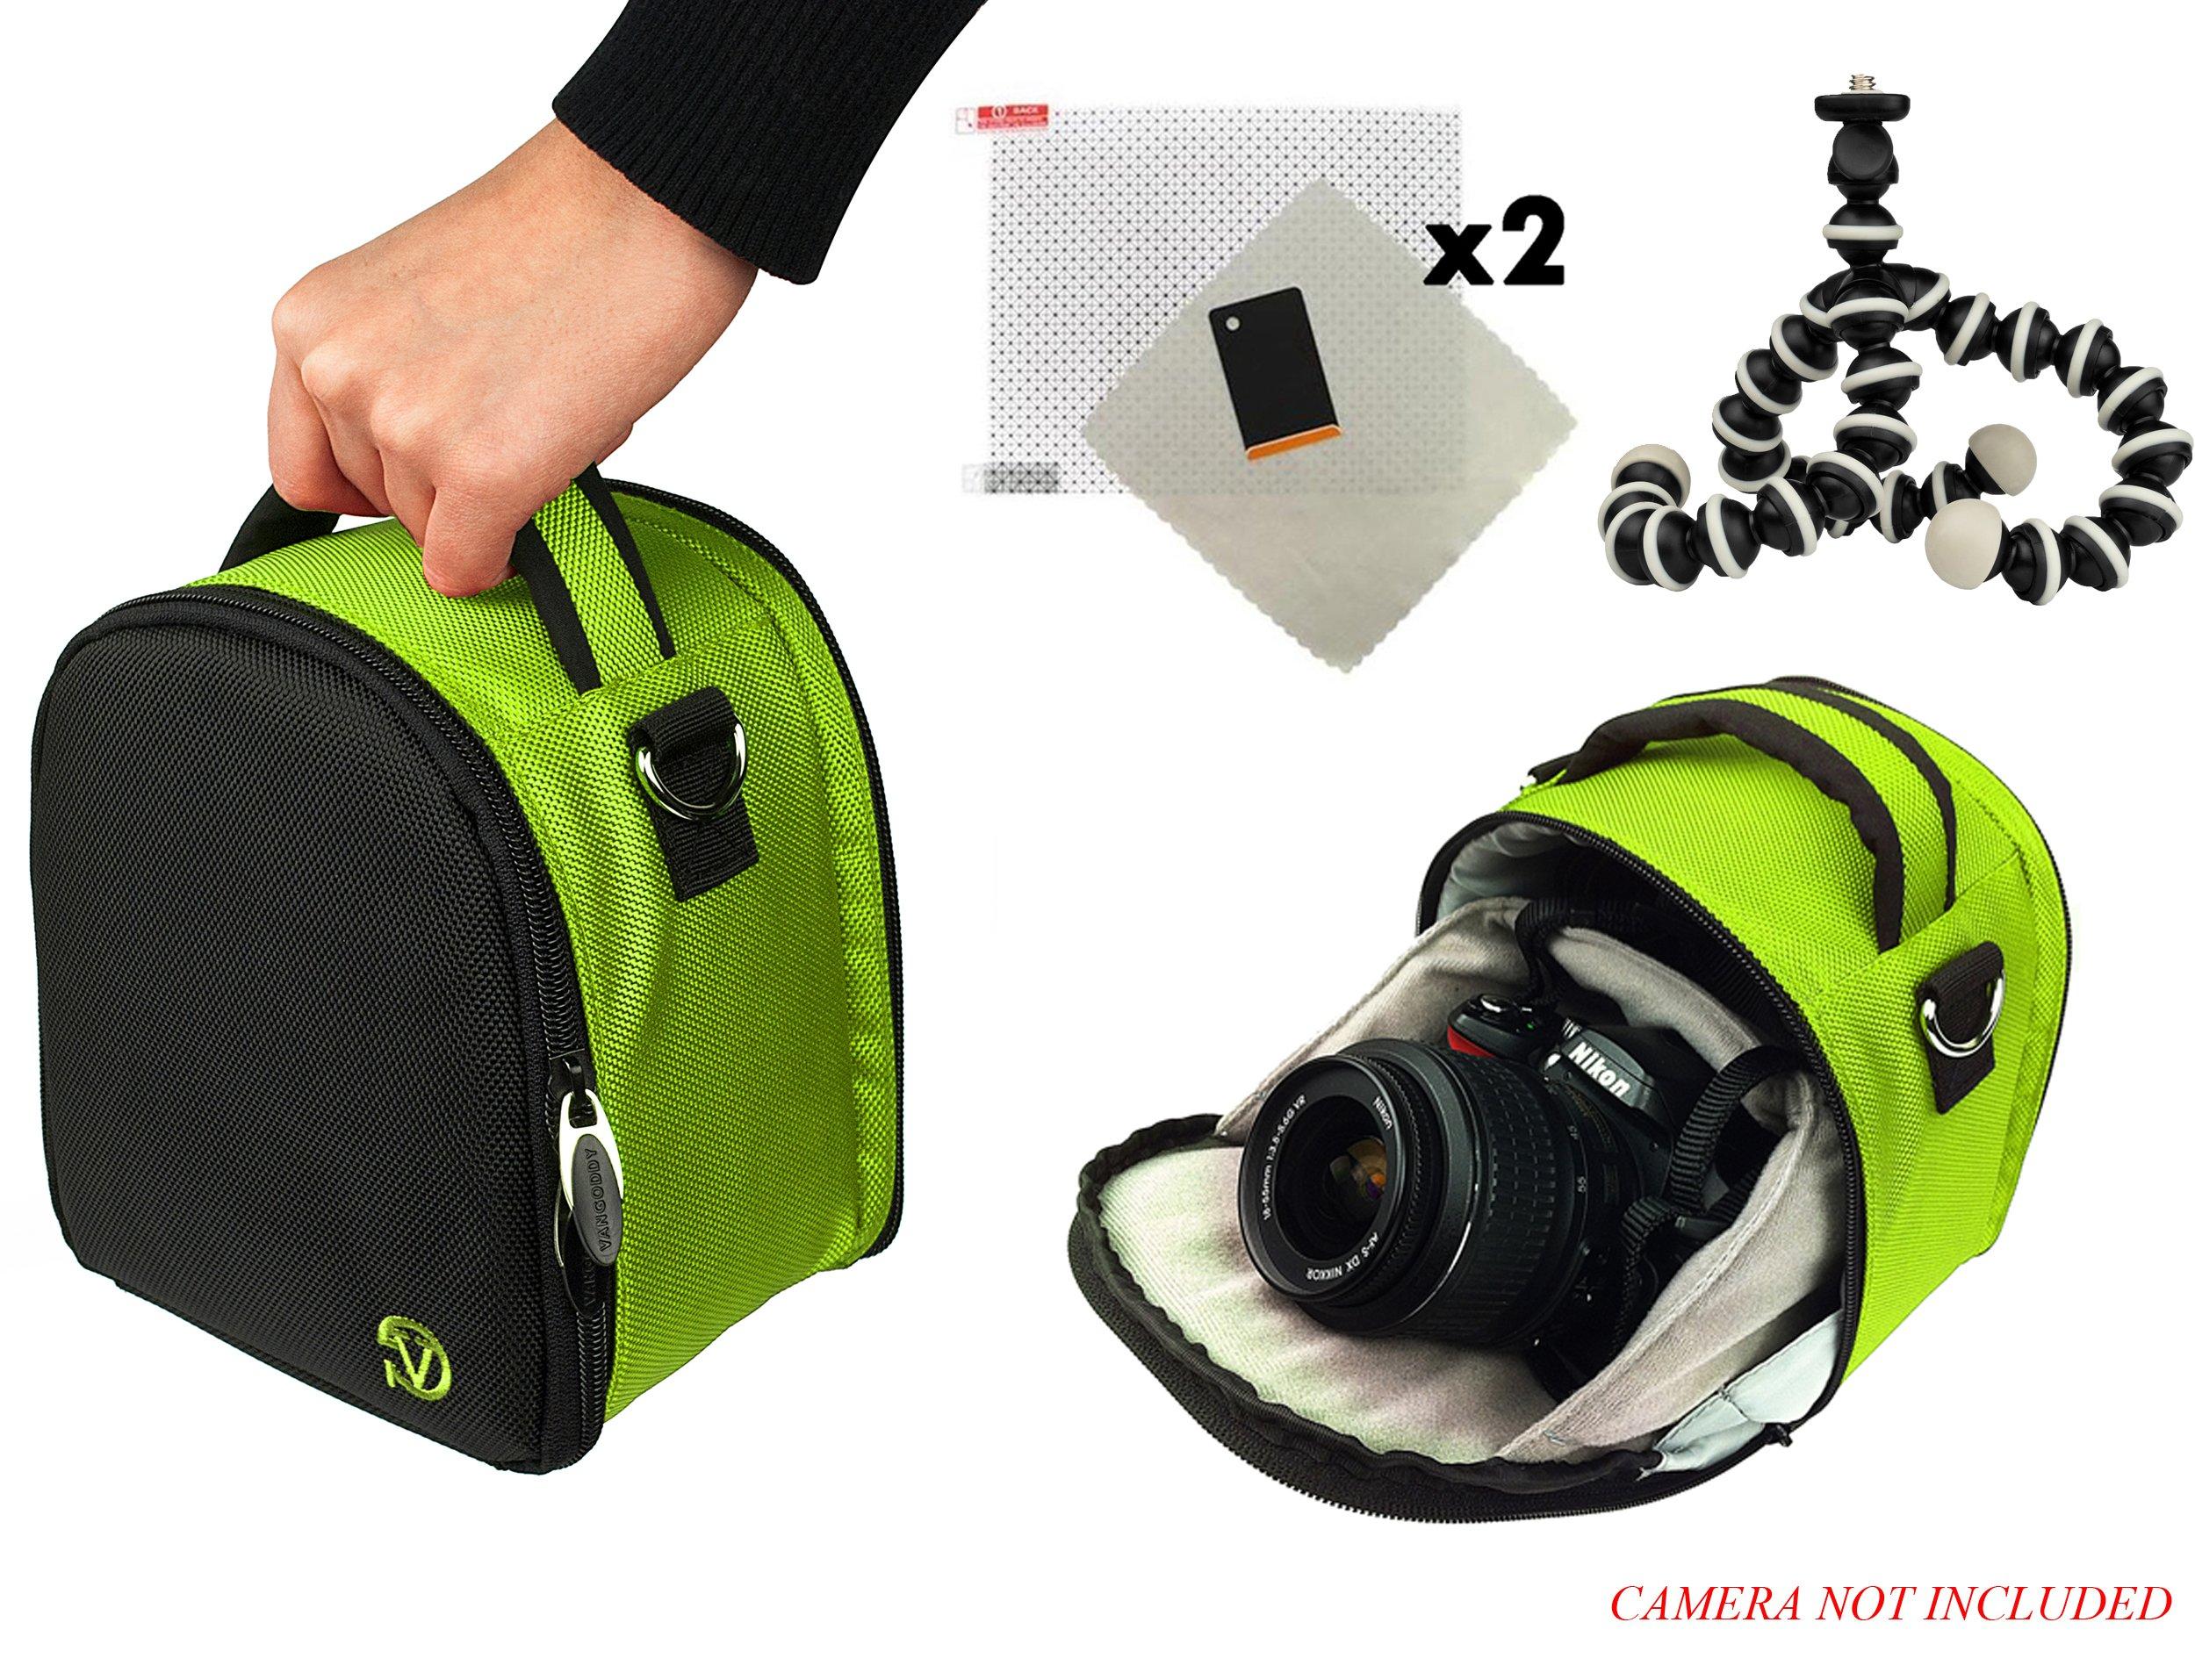 Laurel Travel Camera Bag Case For Samsung WB Series WB1100F, WB2200F, Galaxy NX30 DSLR Camera + Screen Protector + Screen Protector + Mini Tripod